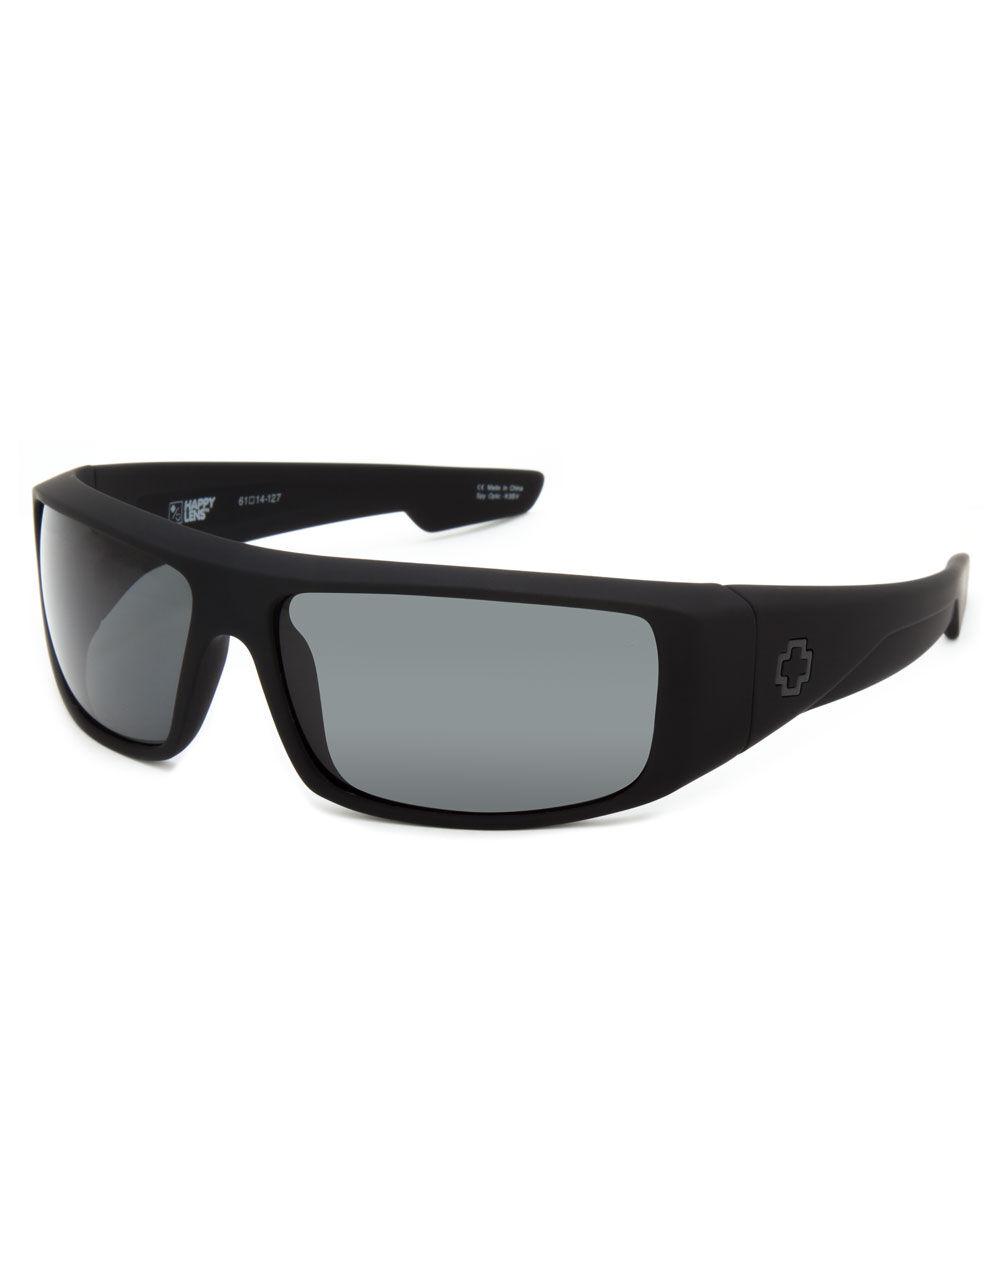 SPY Happy Lens Logan Sunglasses